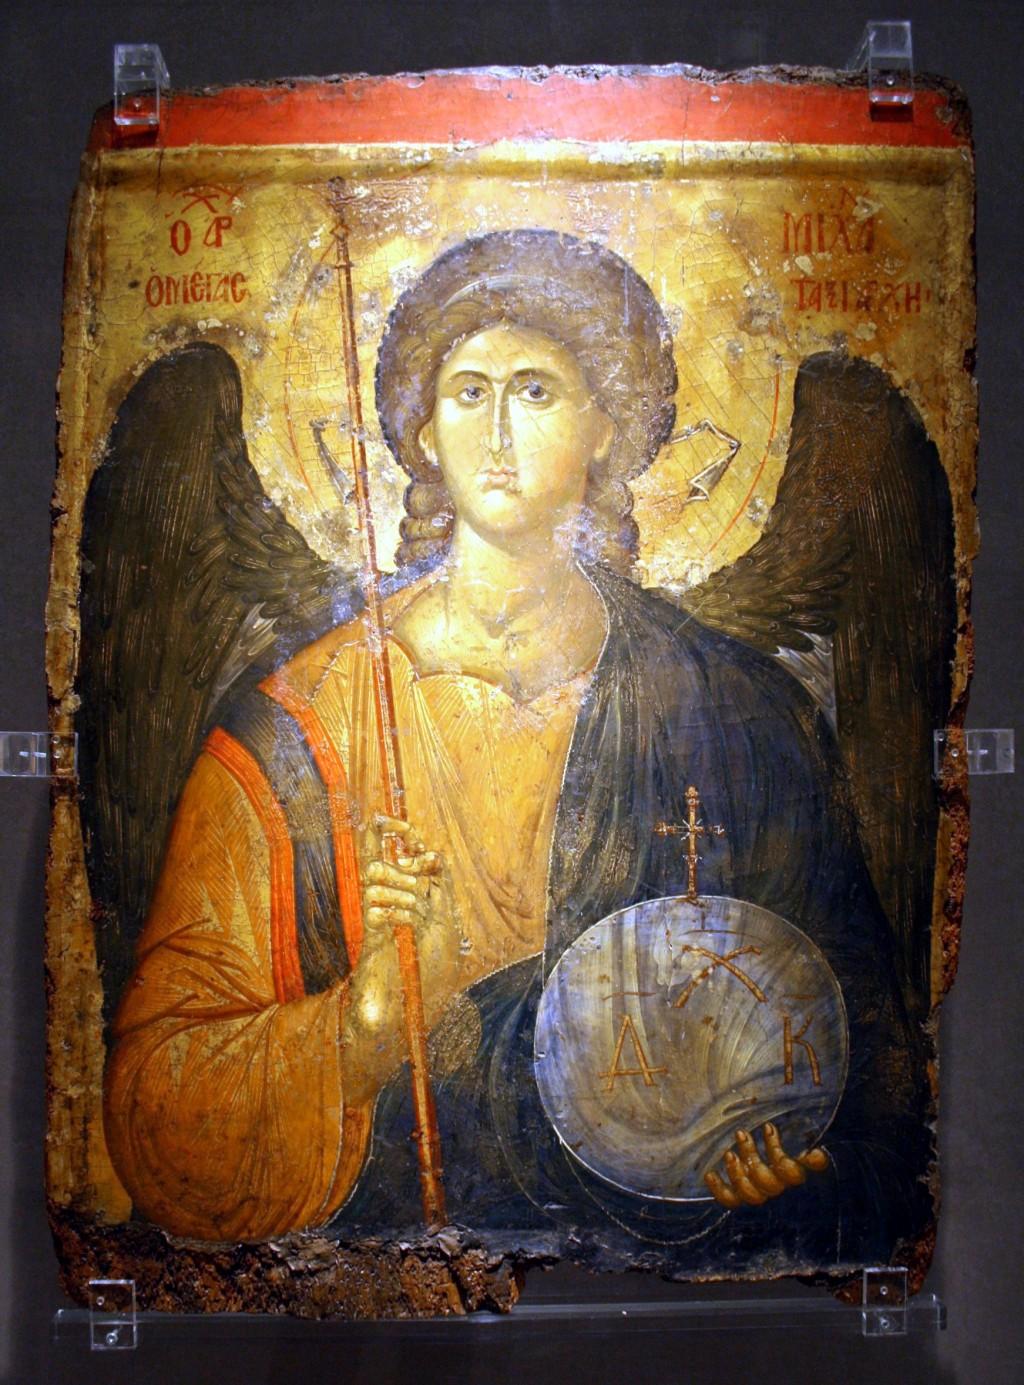 Sankt Mikael, änglafursten